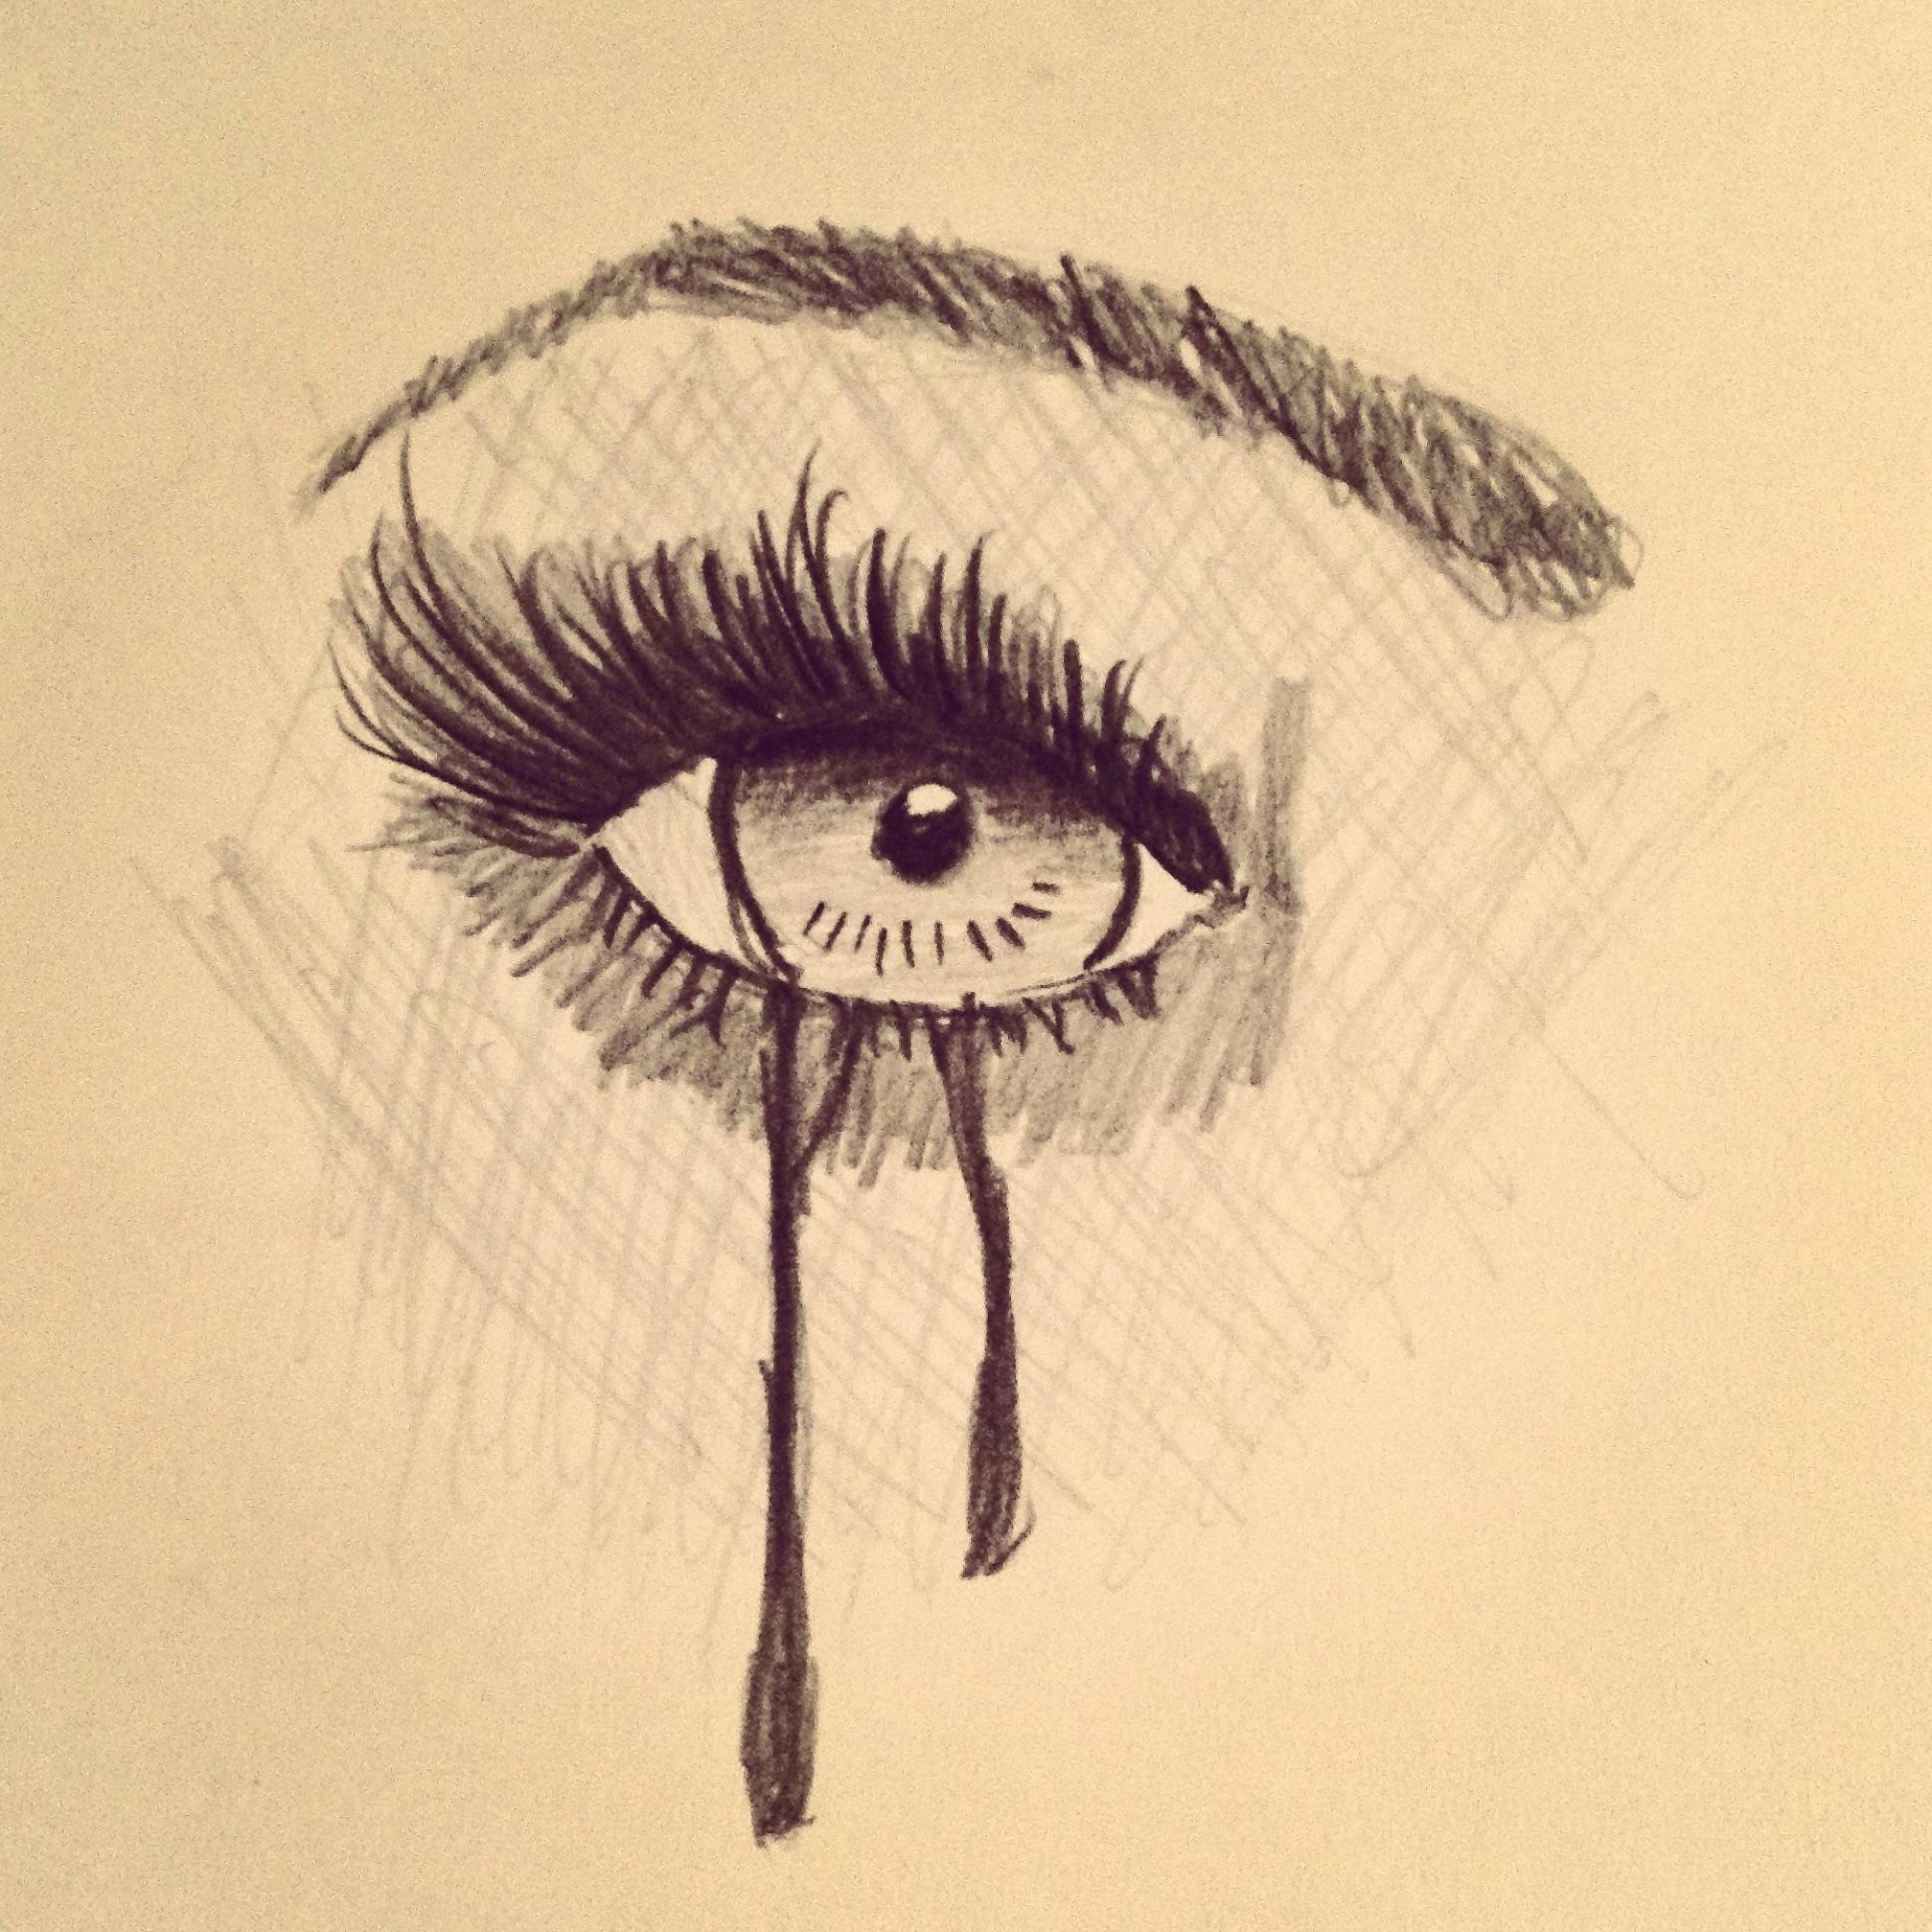 1936x1936 Crying Eye Drawing By Maul Mccartney (C) Art I Drew